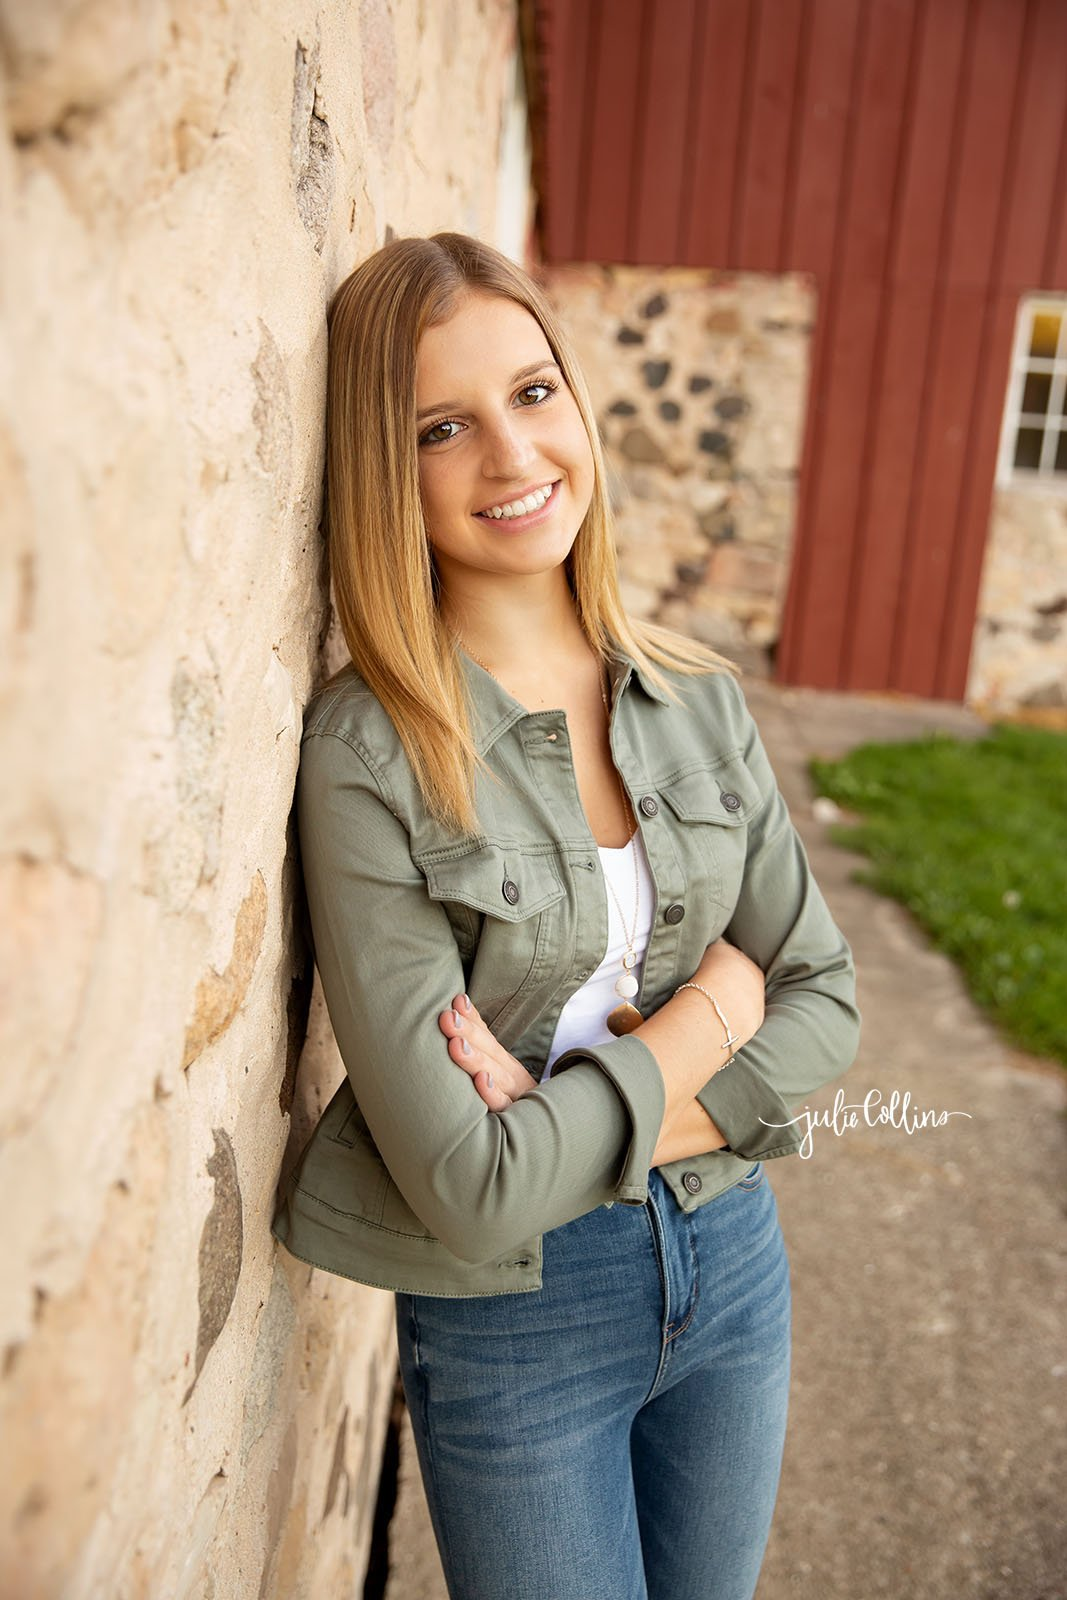 Hartland Arrowhead Senior girl smiling for camera during senior portrait session in Delafield, Wisconsin